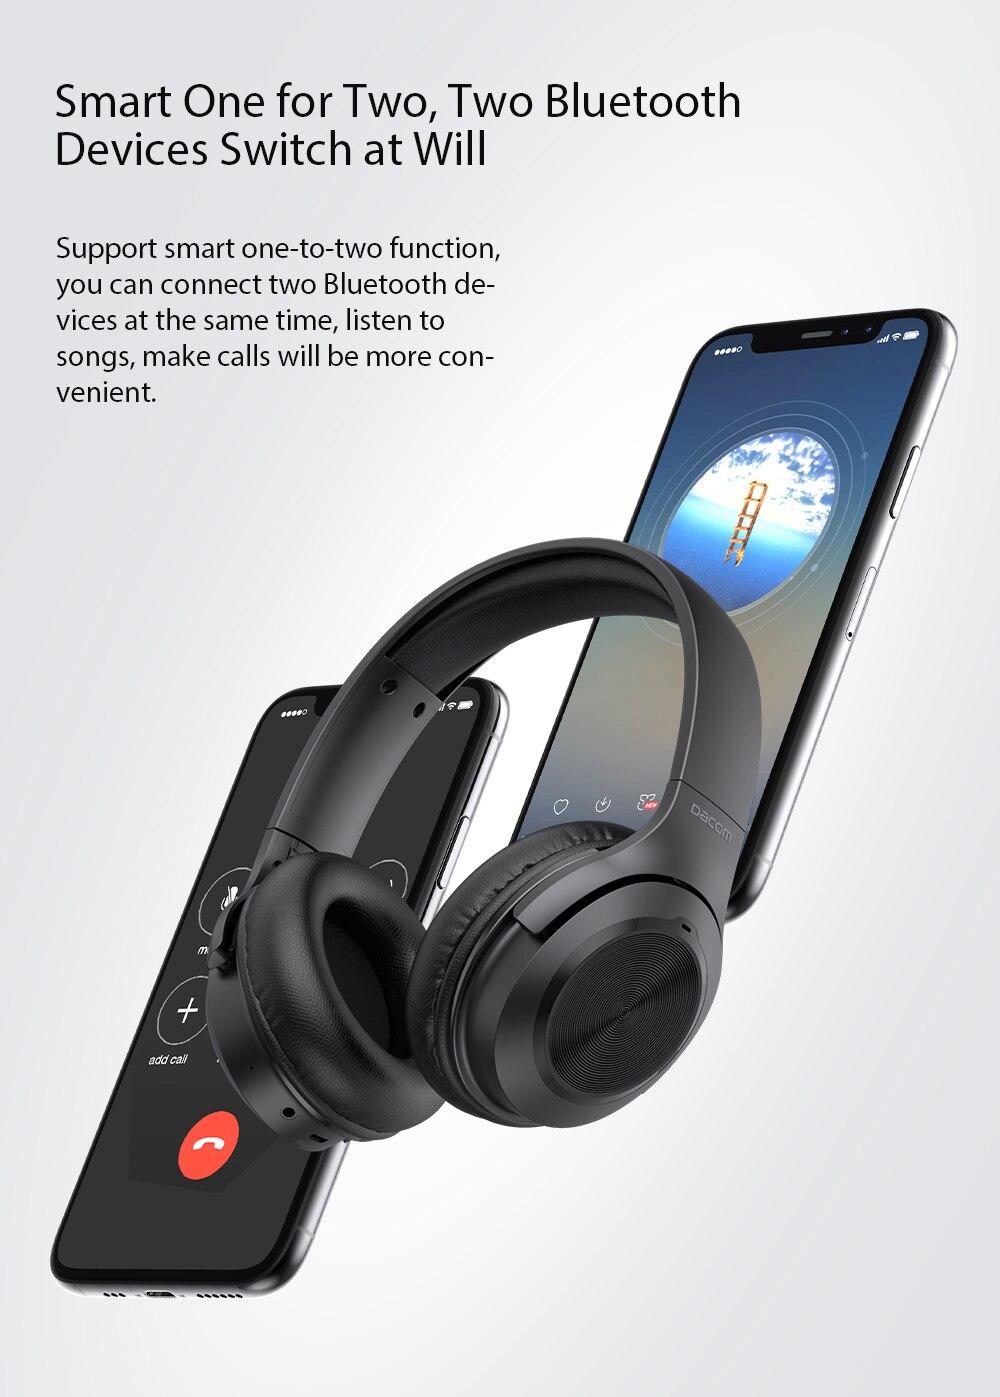 DACOM HF004 Bluetooth Headset Two in One Bluetooth Speaker Deep Bass Stereo  Wired/Wireless Headphone for iPhone Samsung TV|Bluetooth Earphones &  Headphones| - AliExpress